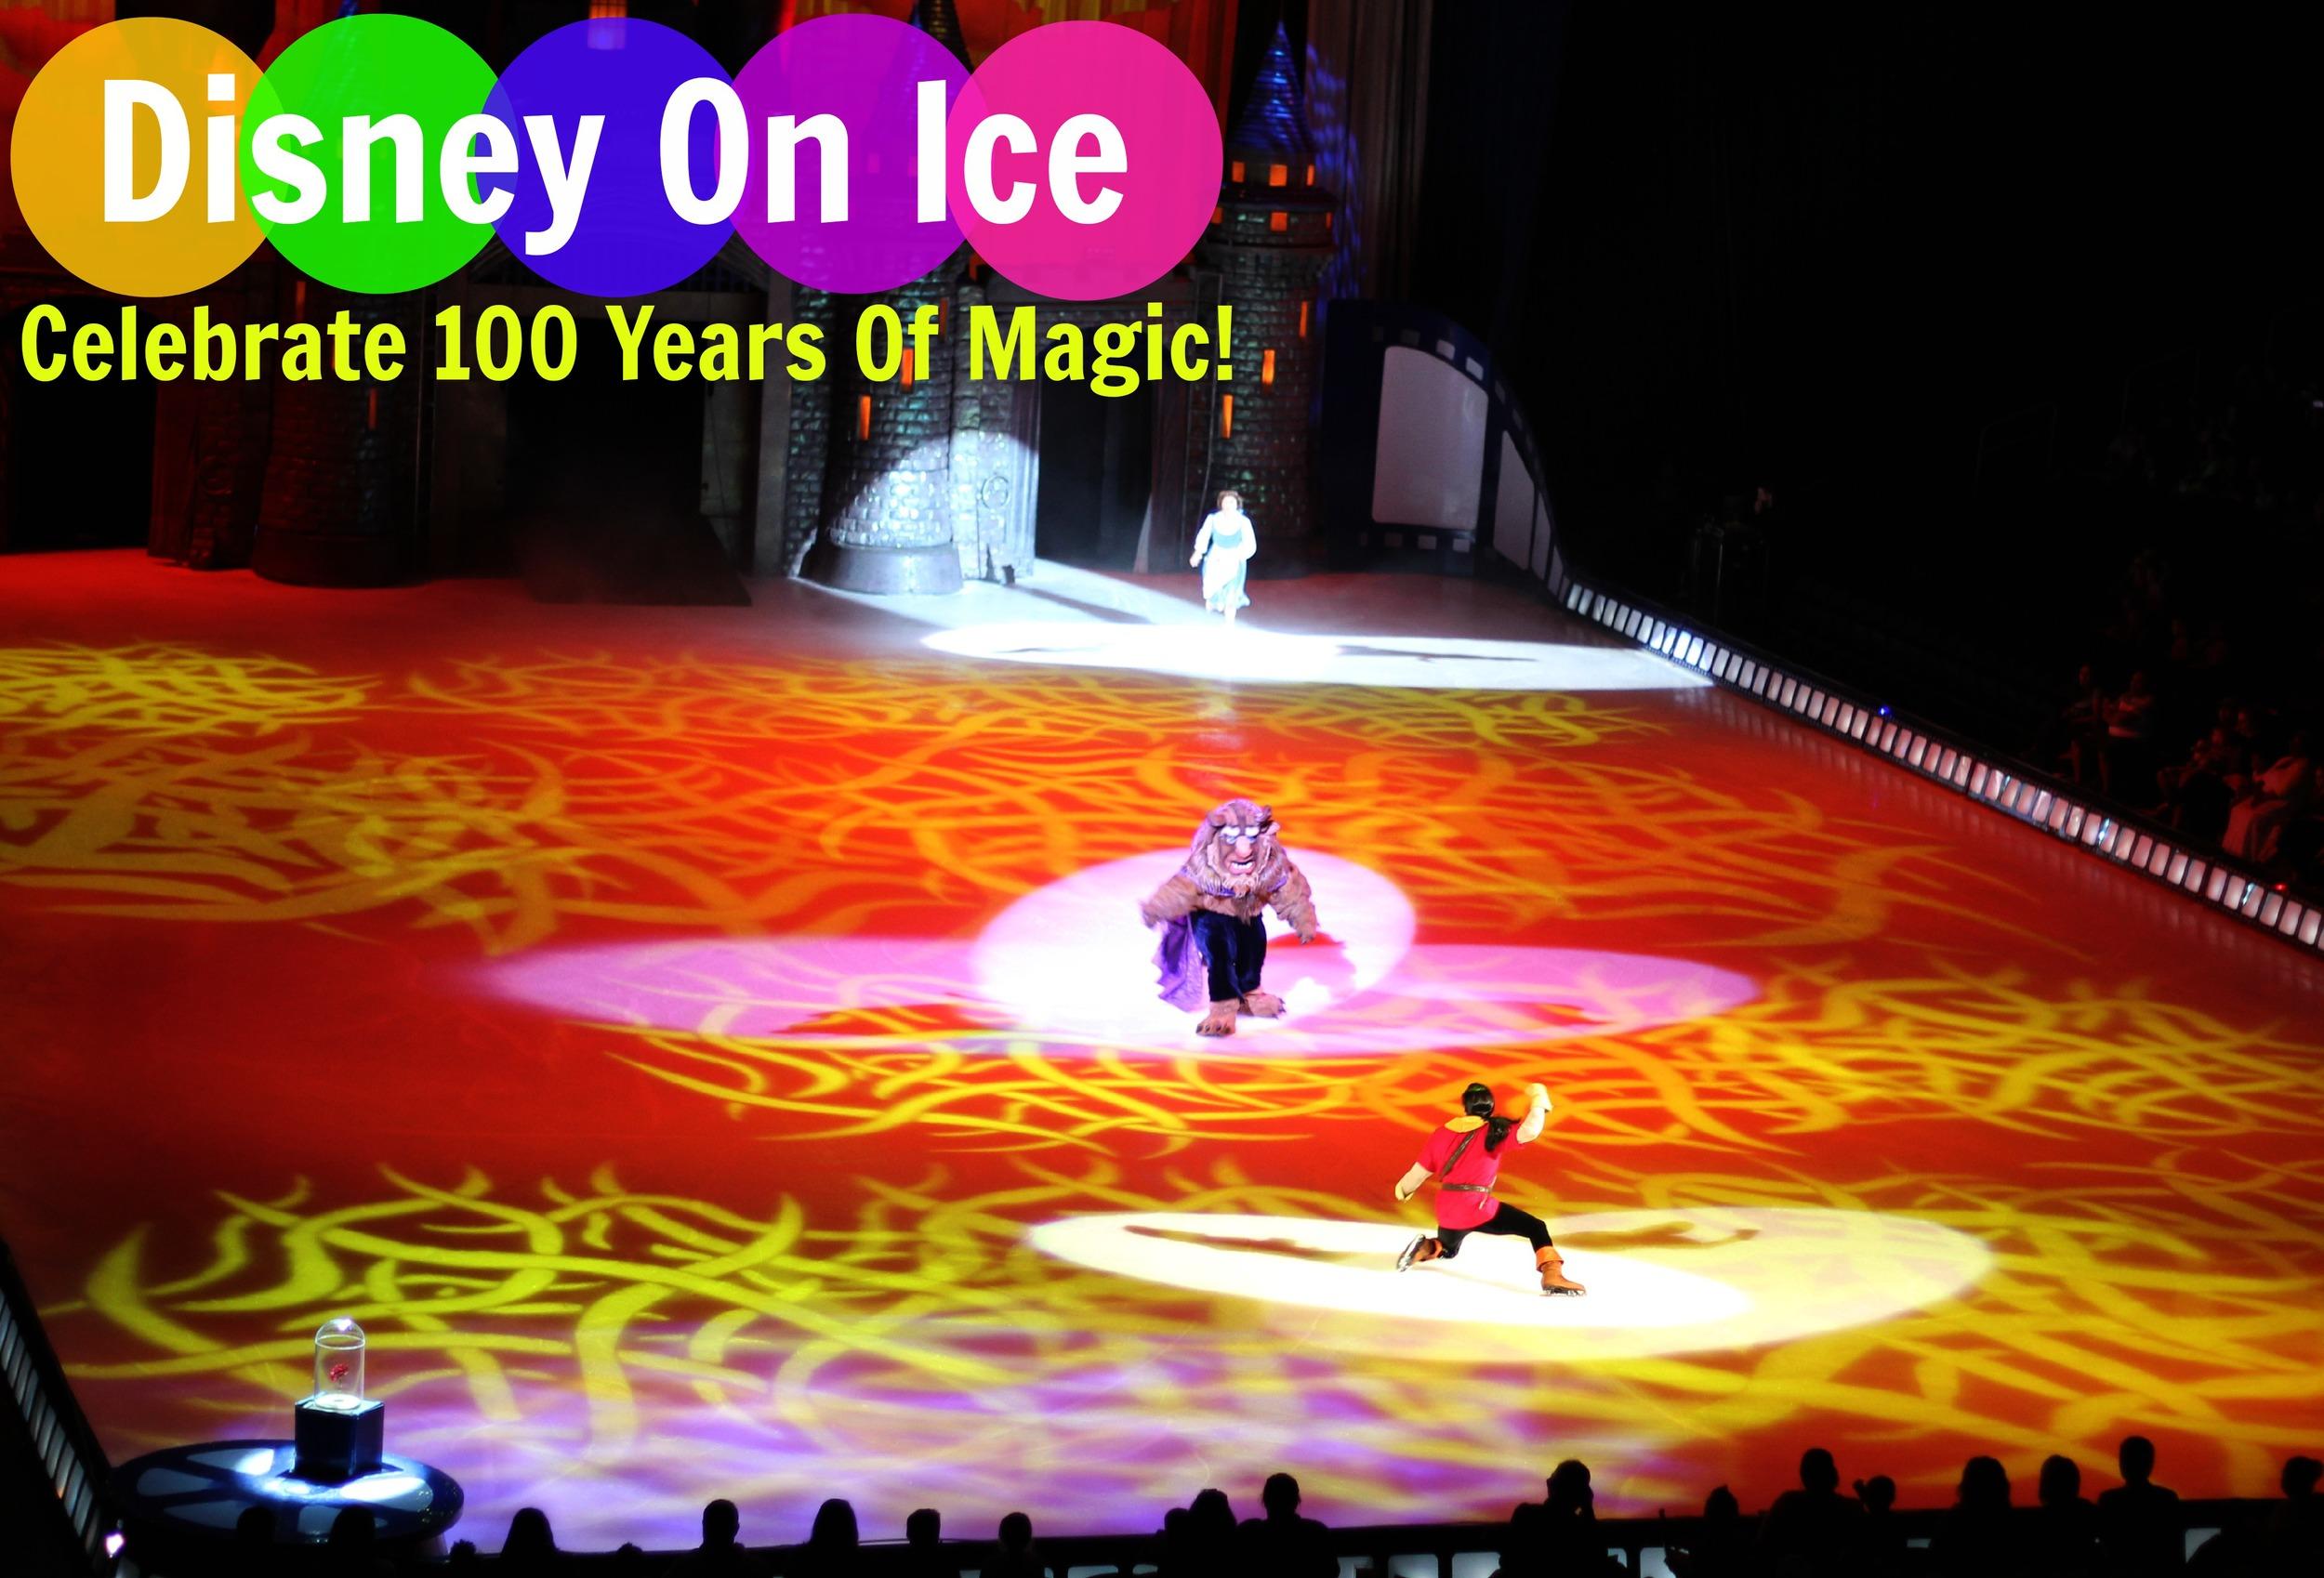 Disney On Ice Celebrates 100 Years Of Magic In Atlanta